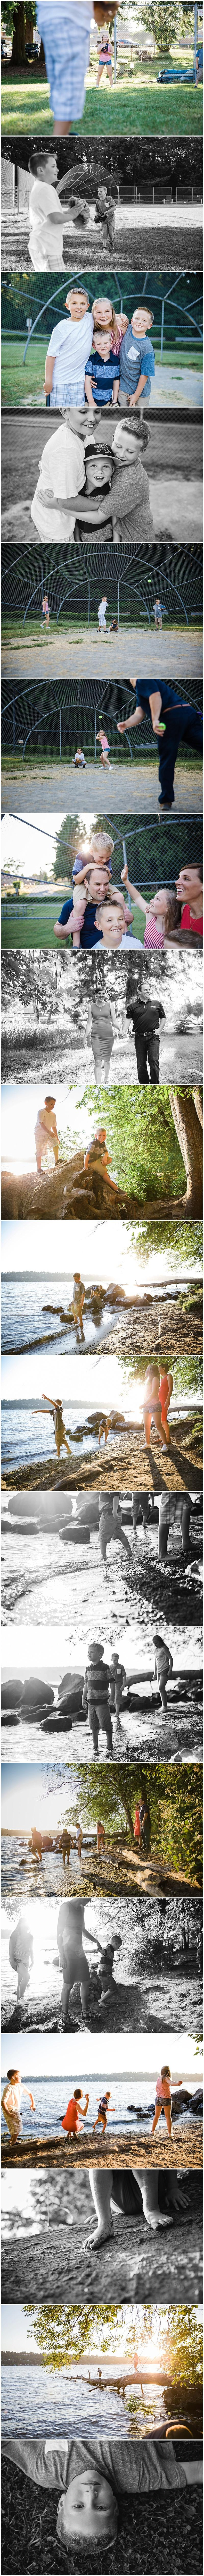 Baseball, a hike and splashing // Kirkland Family Photographer